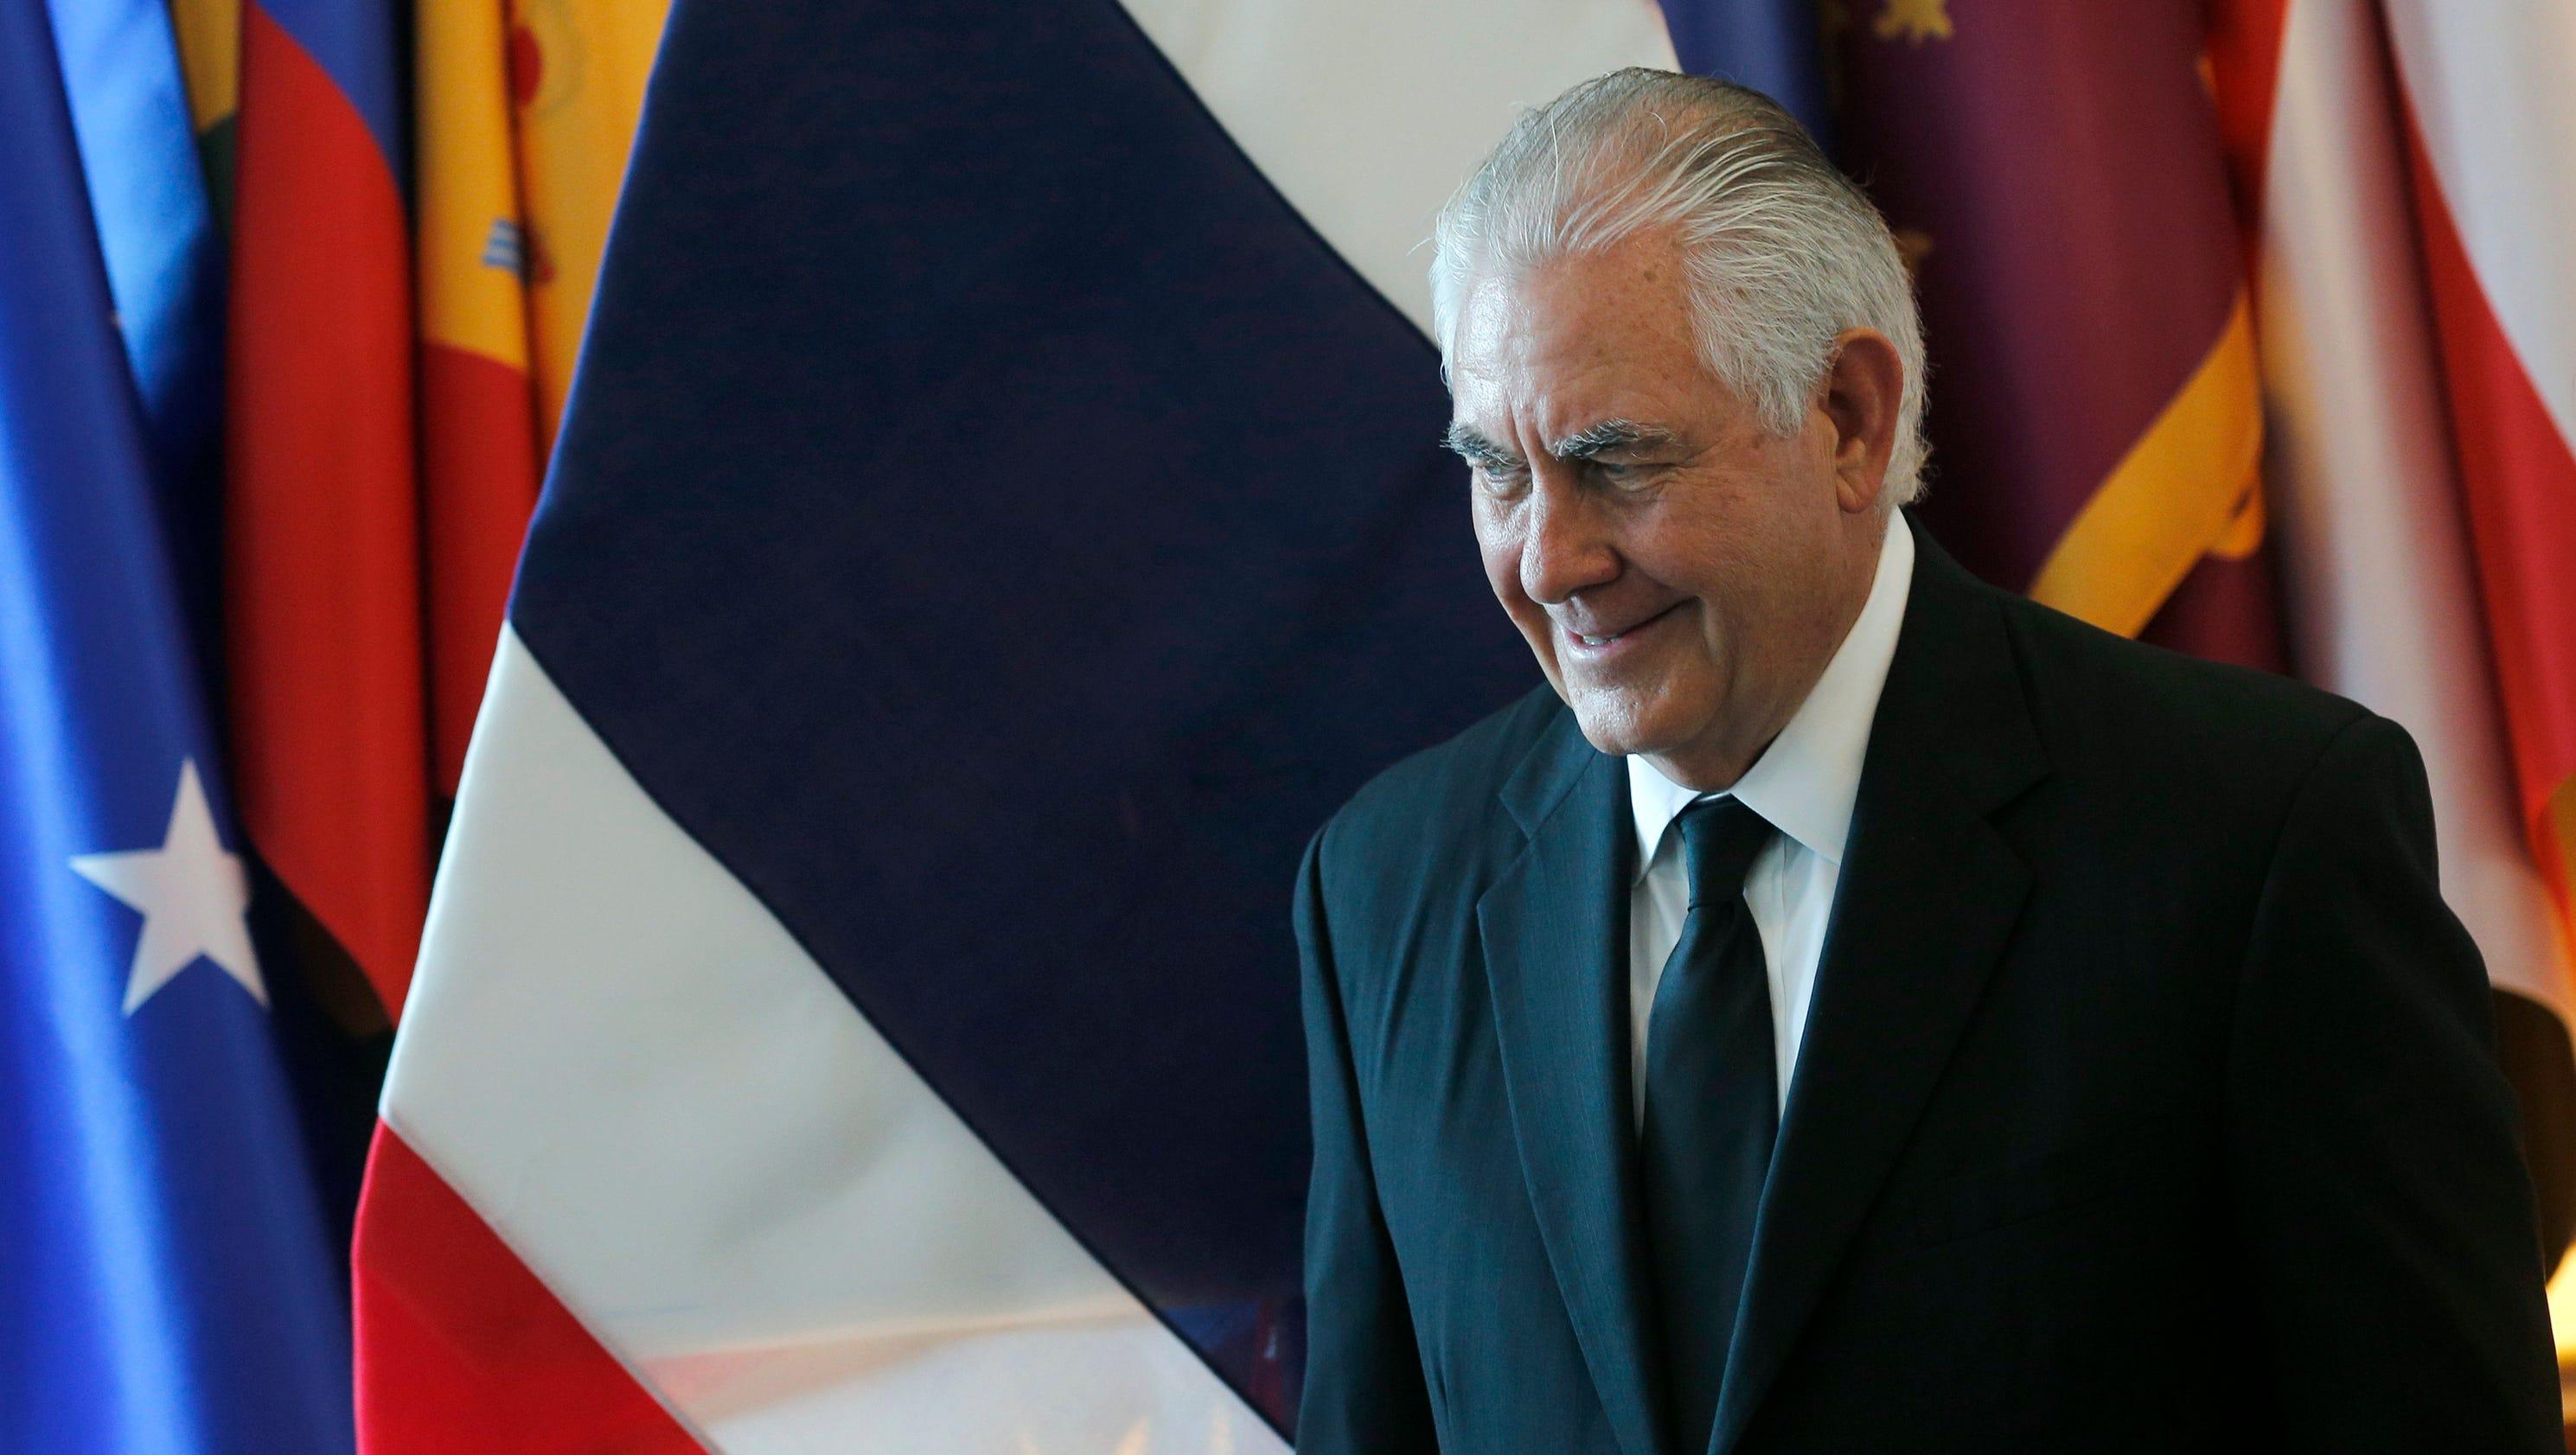 To tame North Korea, Secretary of State Rex Tillerson must master Washington